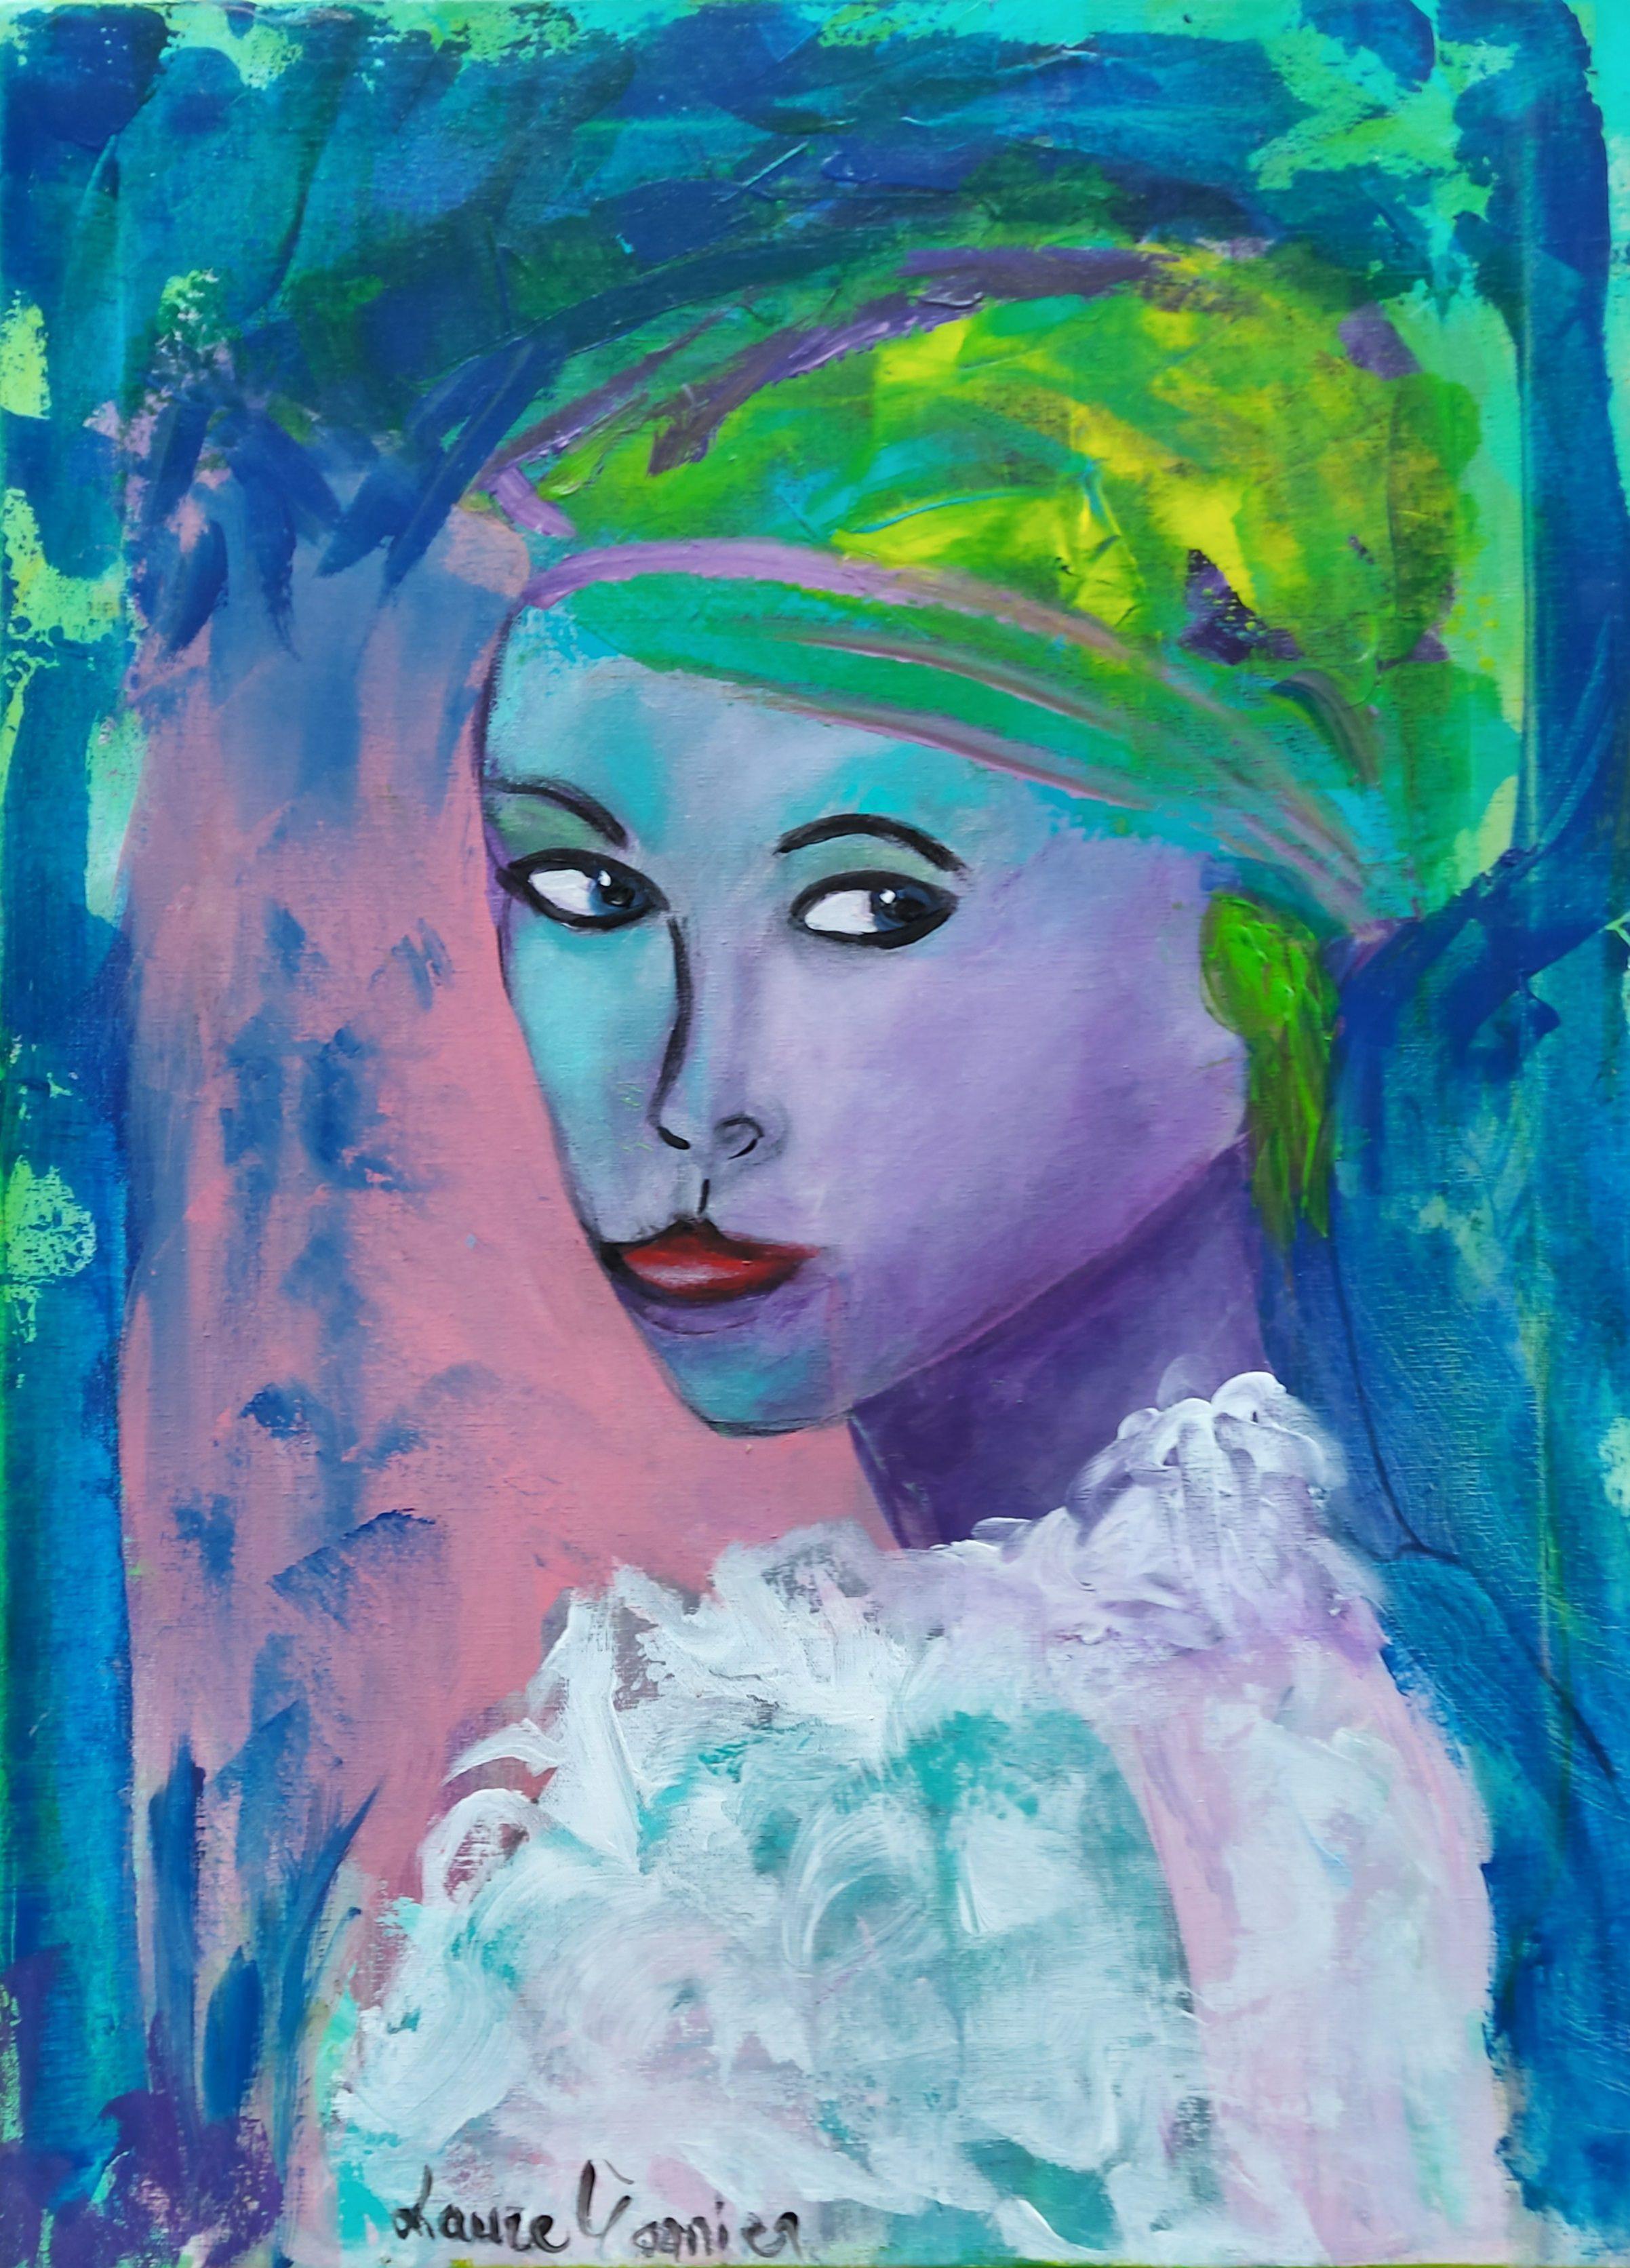 La femme au turban